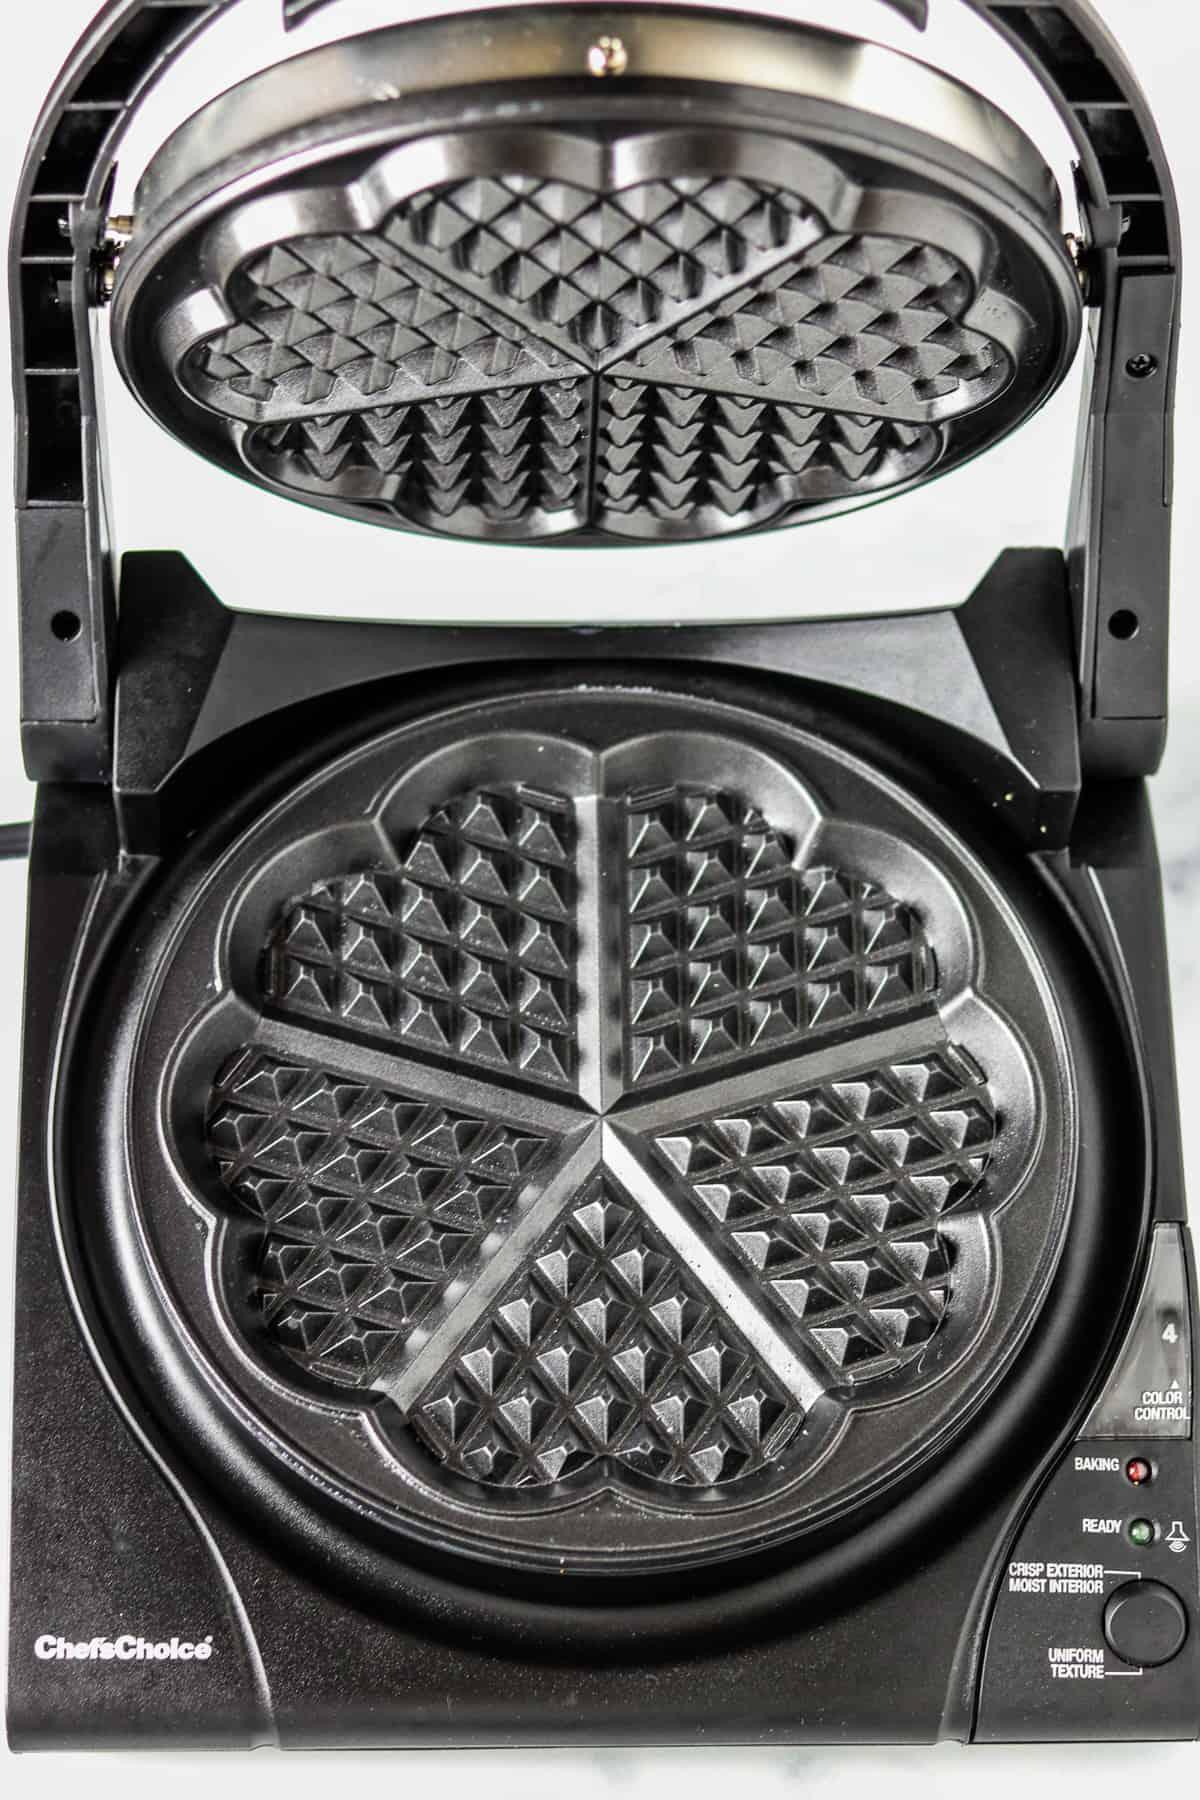 Heart shaped waffle maker.